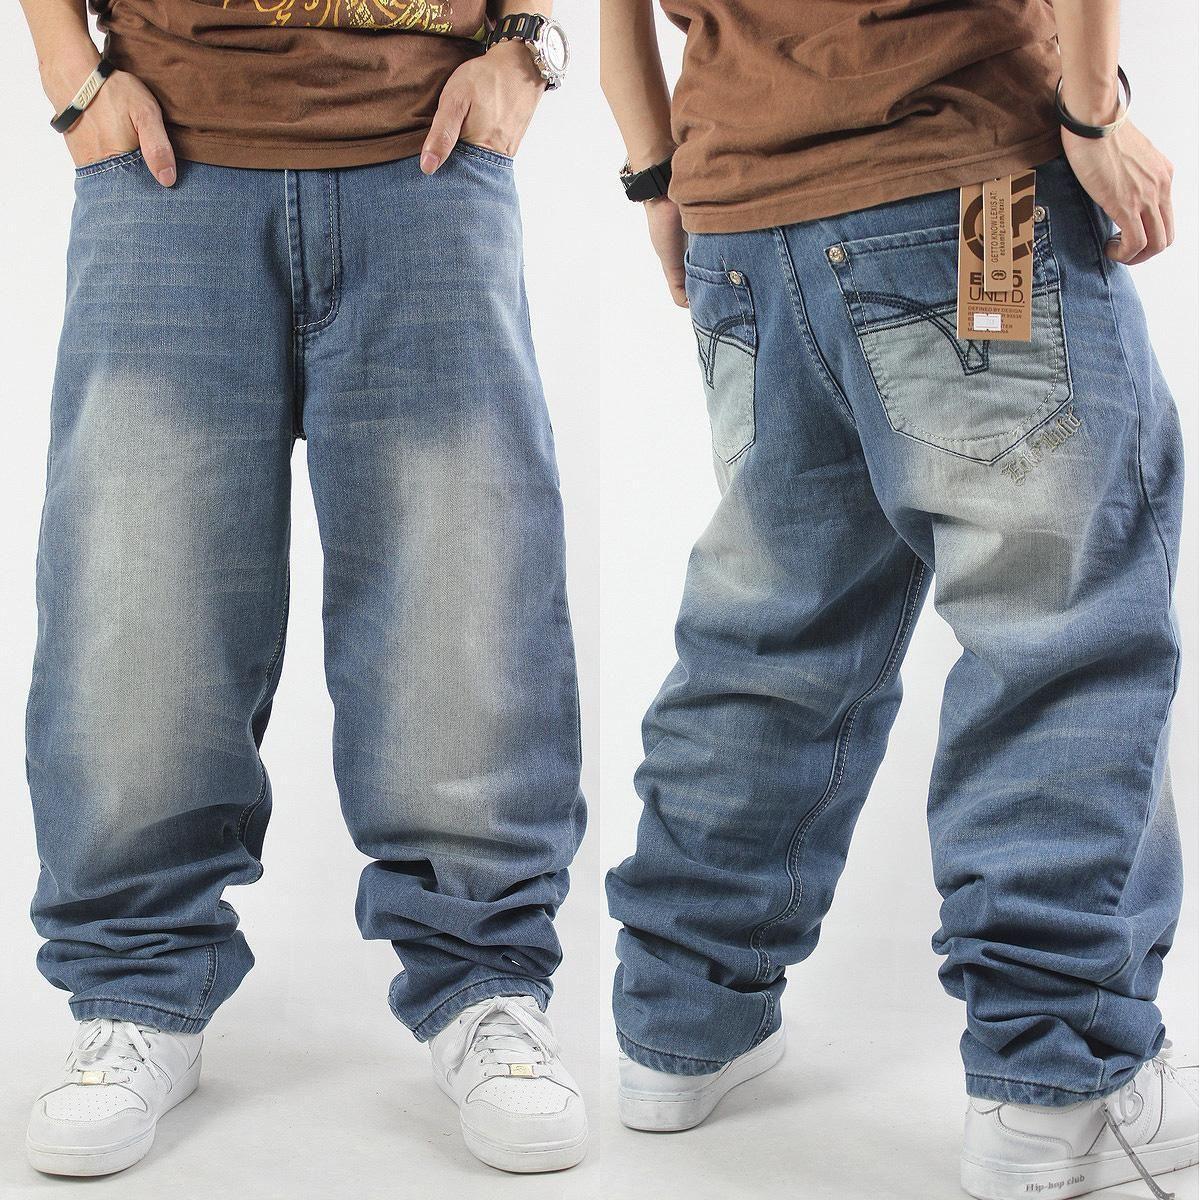 Pantalons Amples Pantalones Anchos Hombre Ropa Moda Hombre